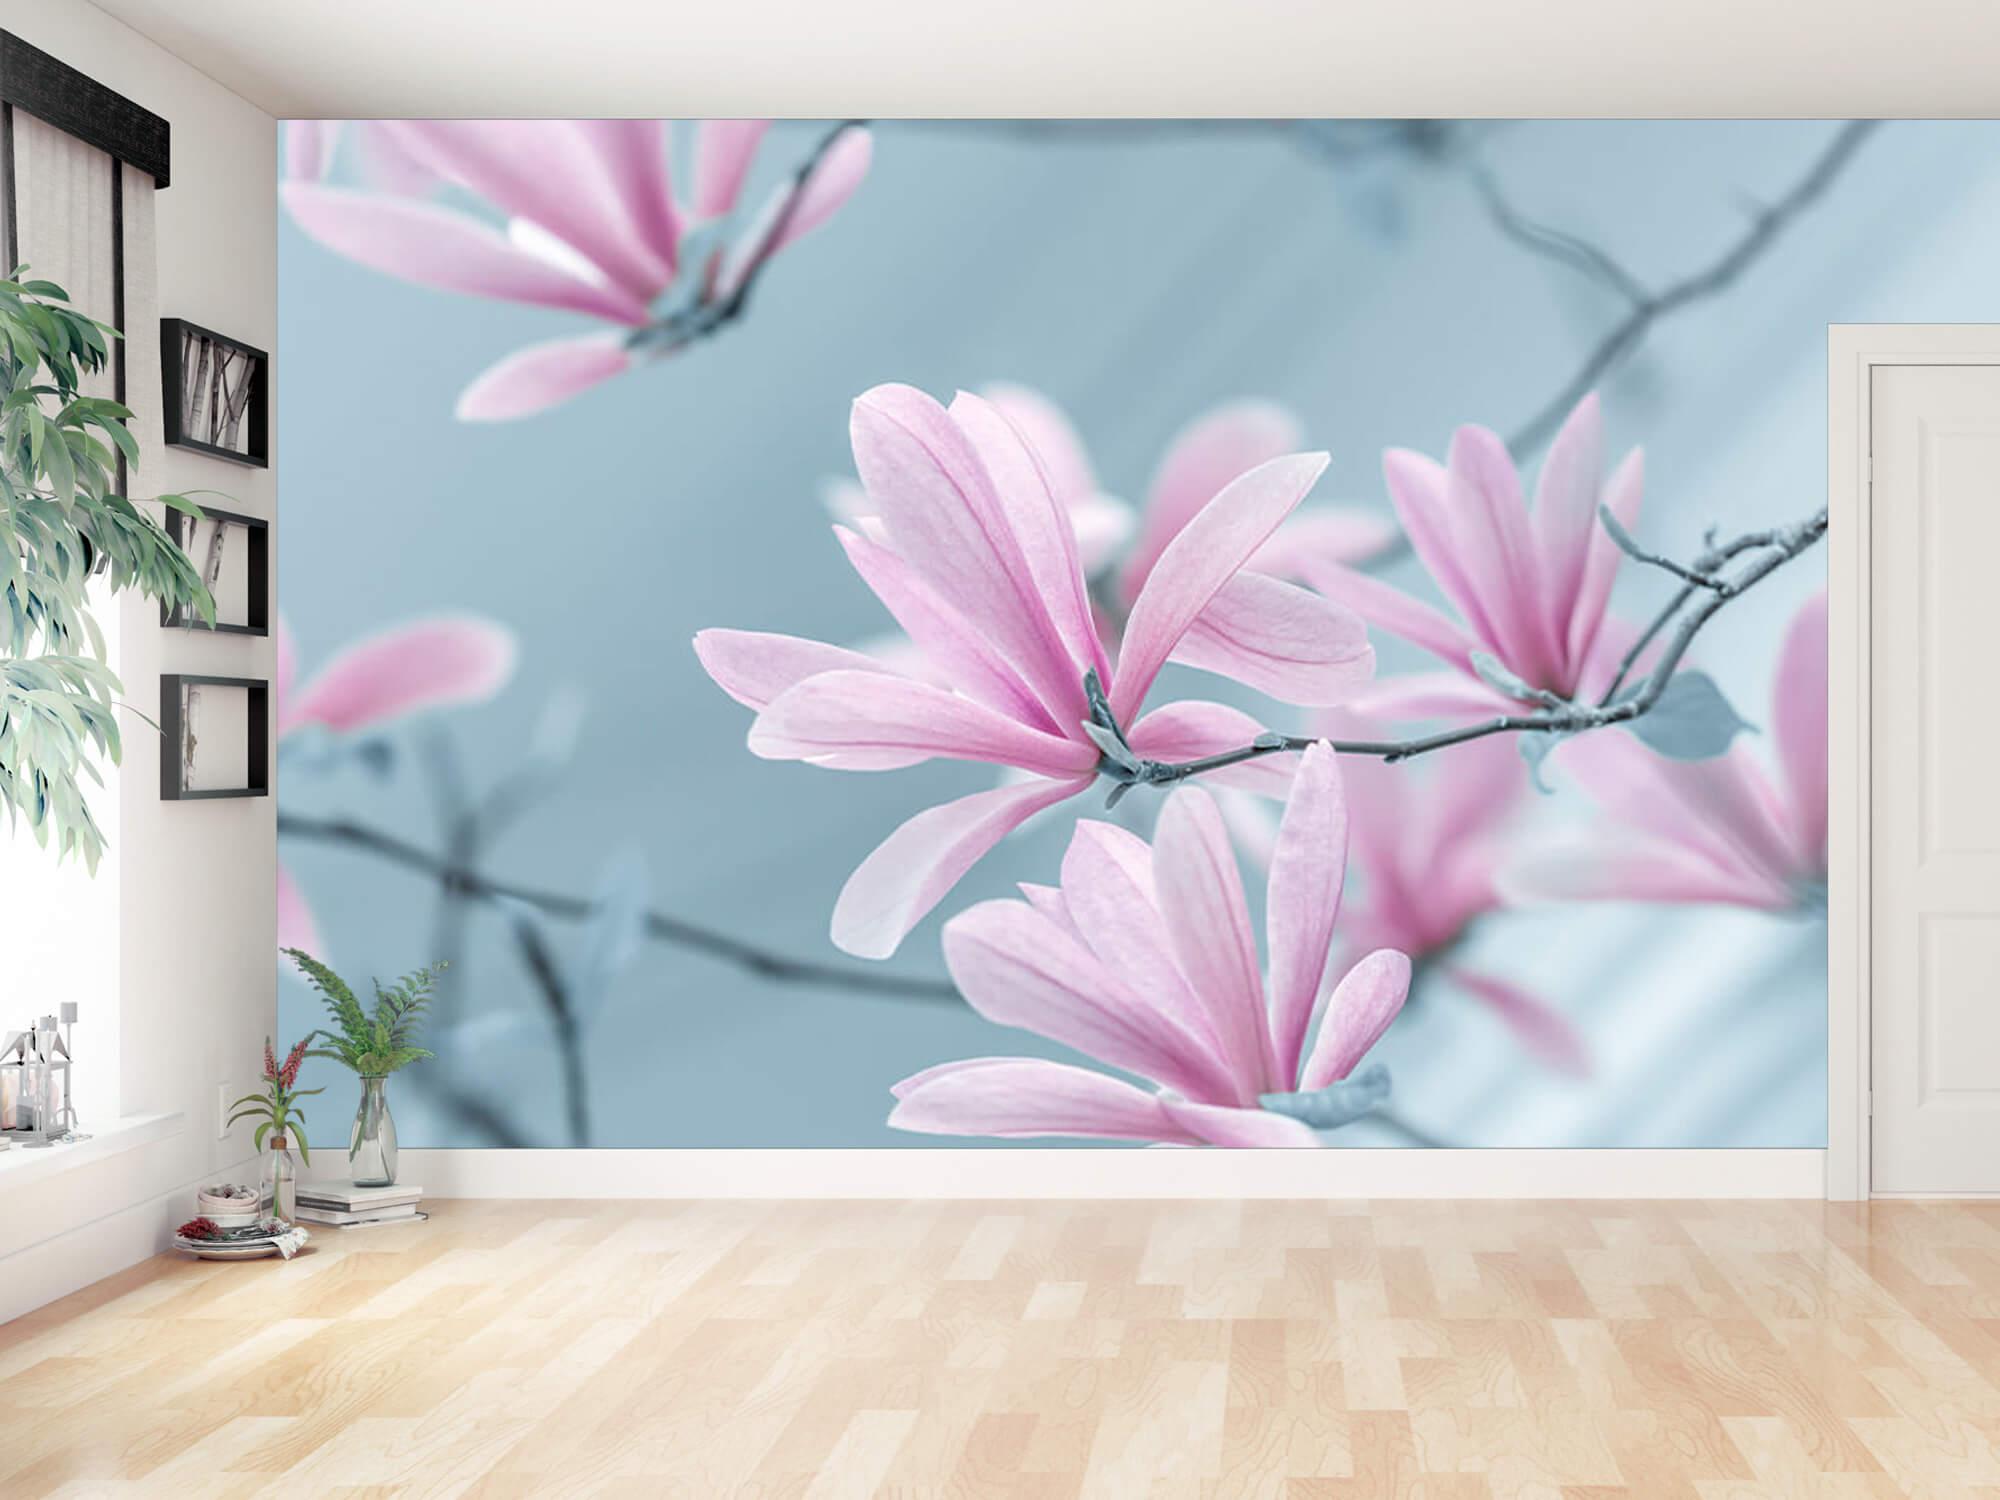 Magnolia bloemen 8